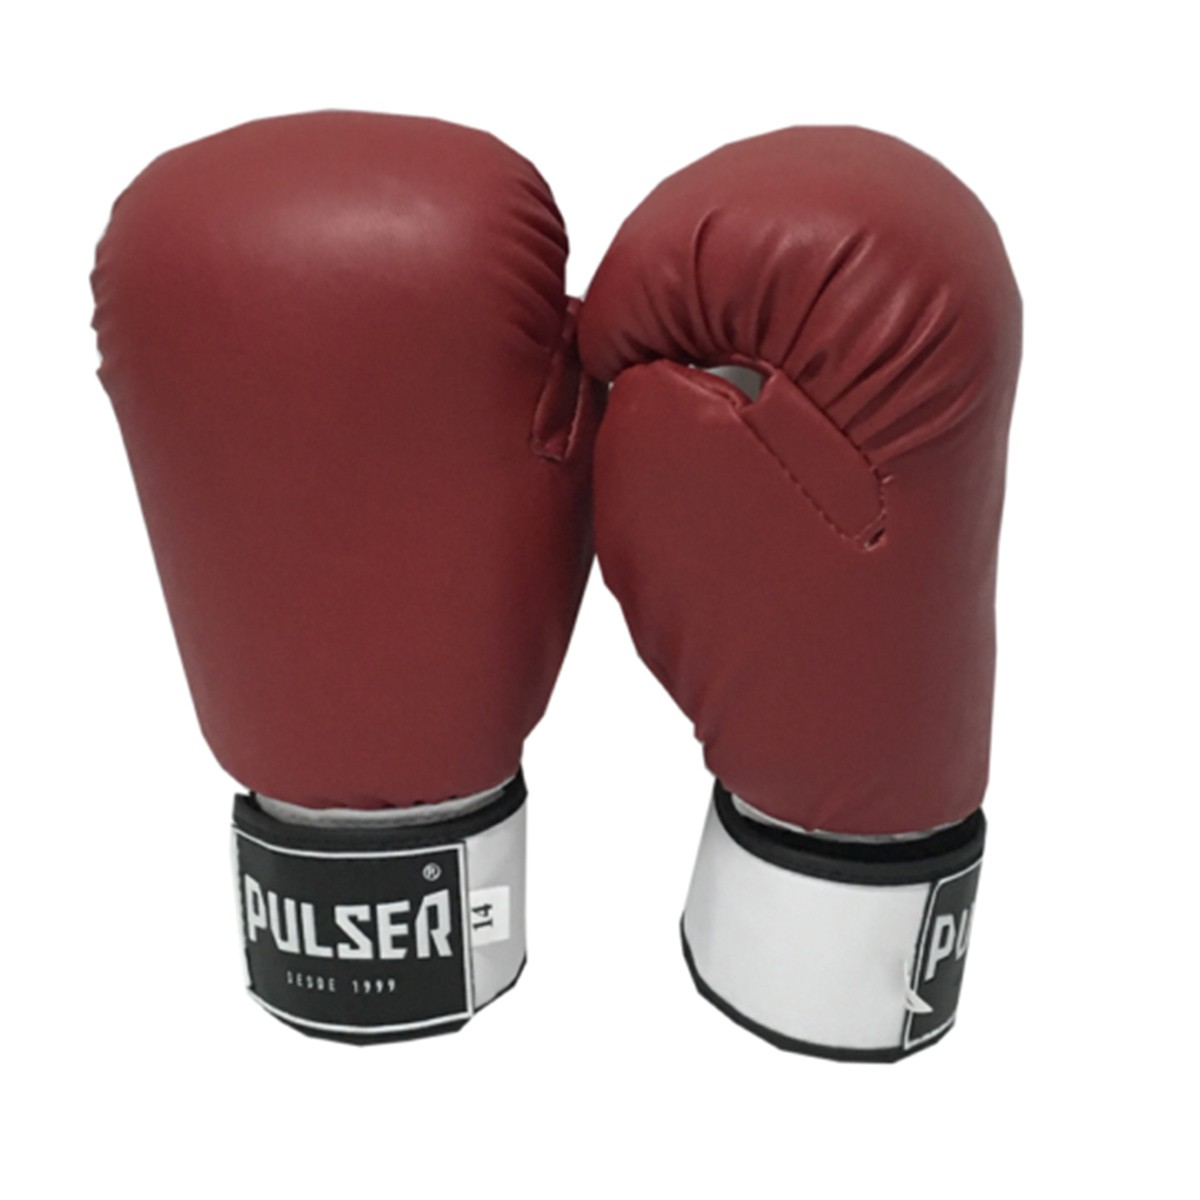 Kit de Muay Thai / Kickboxing 12oz - Vermelho - Pulser  - PRALUTA SHOP